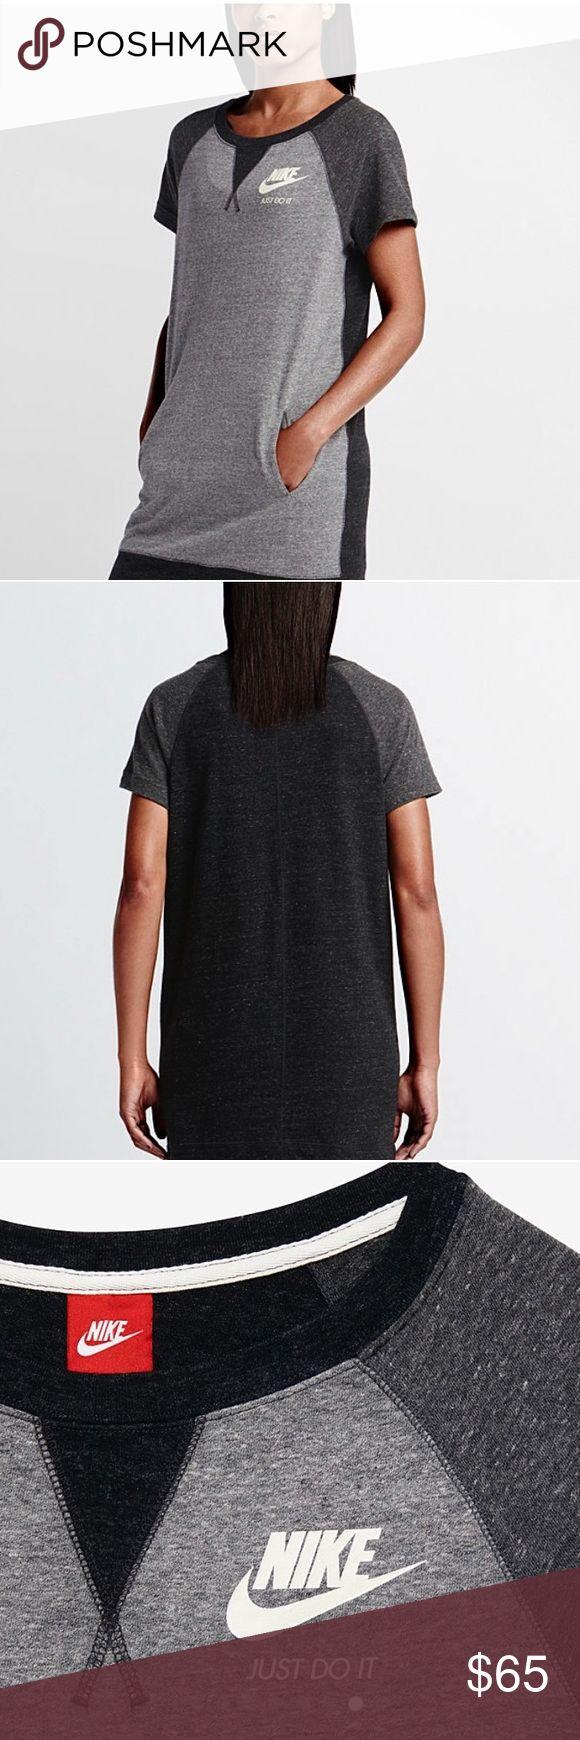 Nike dress Nike dress.  NWT.  Designed for a relax feel.  Raglan sleeves.  Kangaroo pocket. Nike Dresses Mini